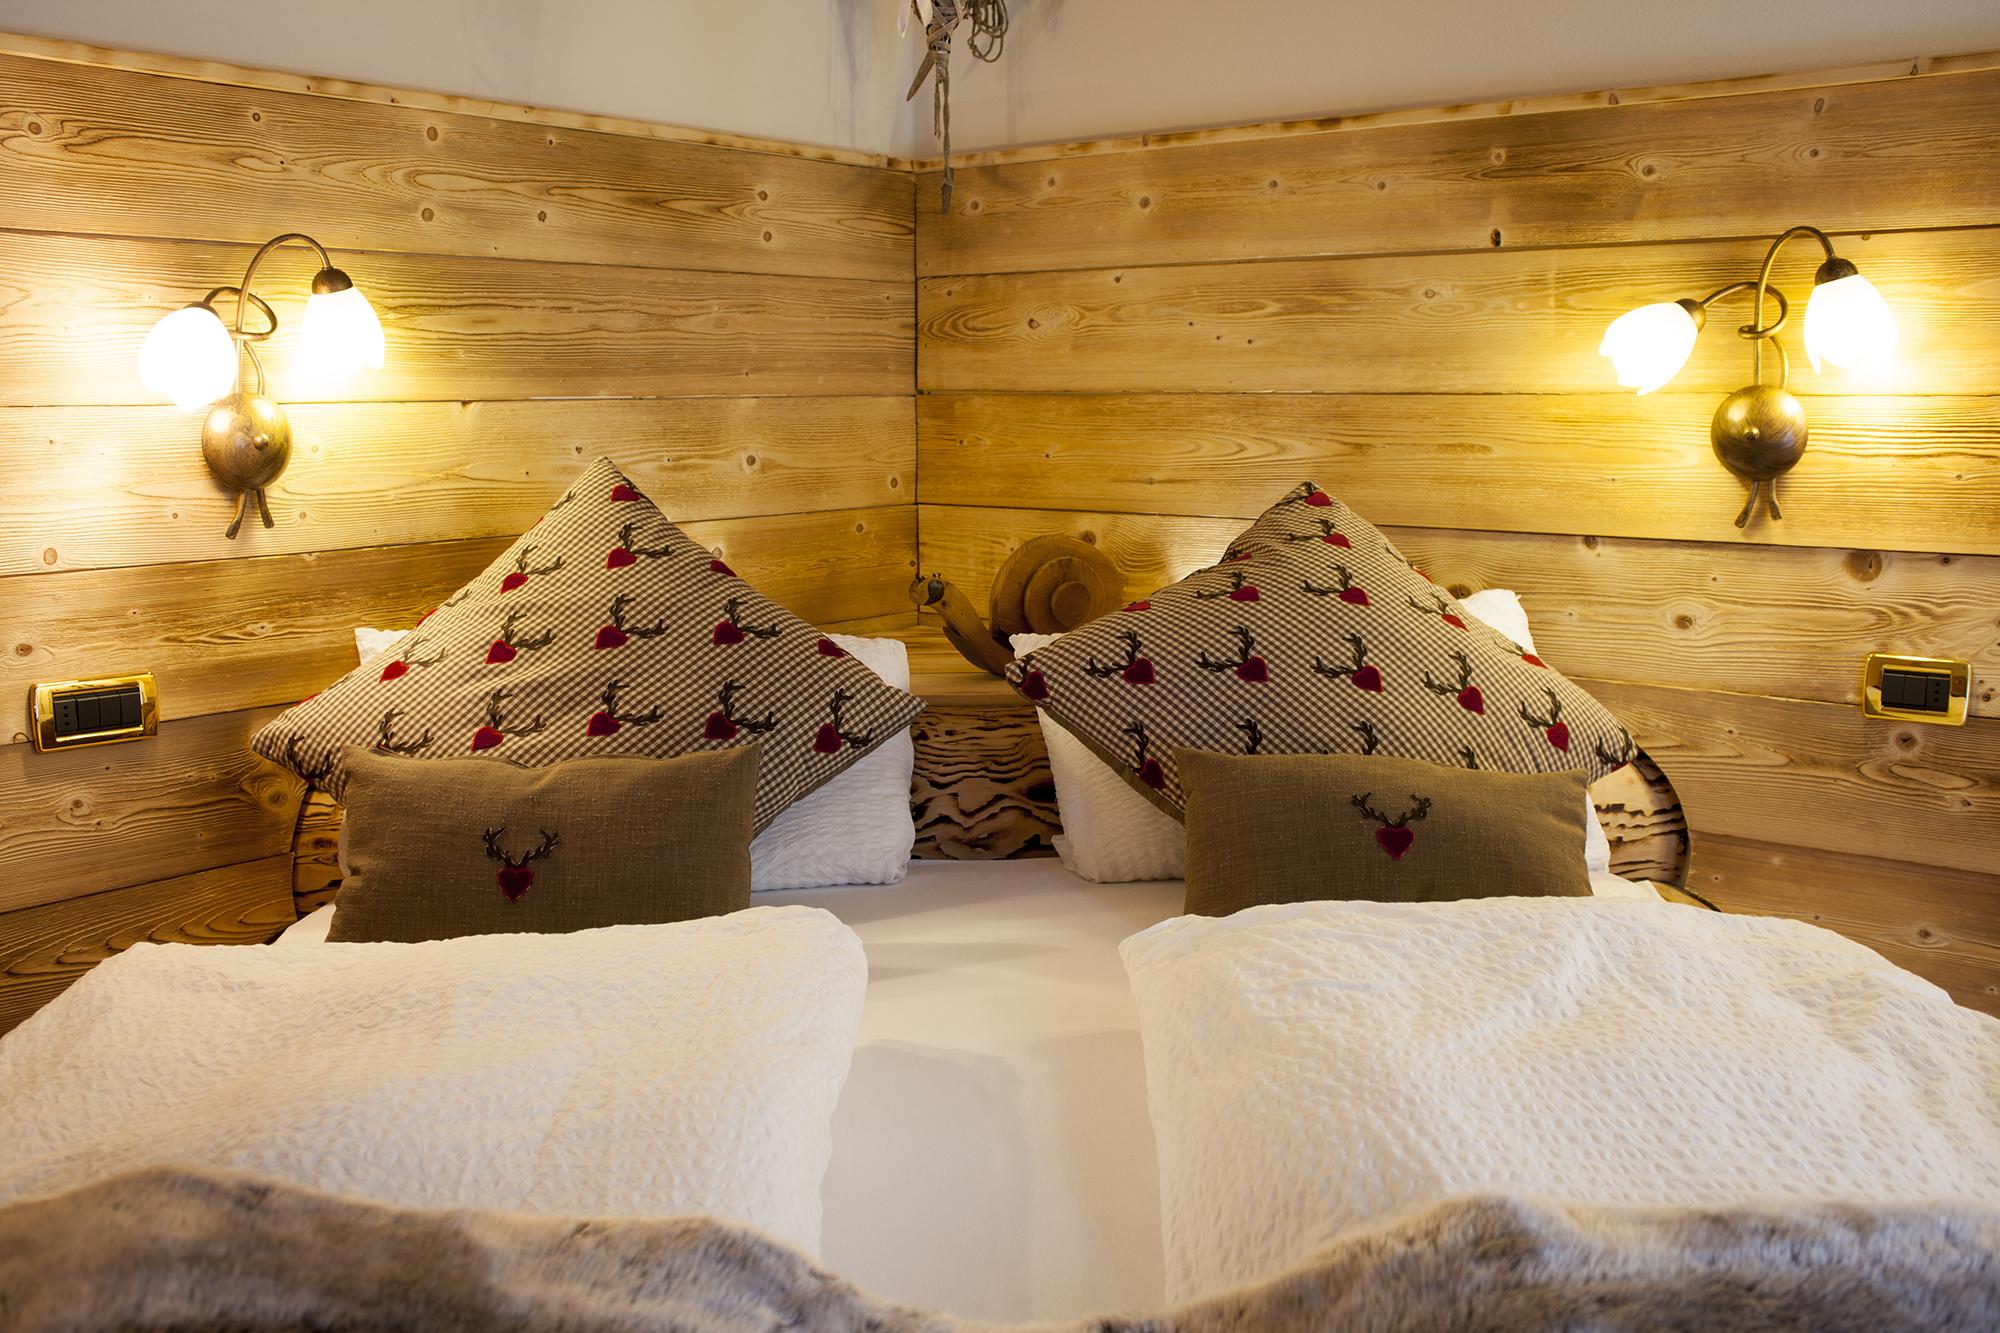 Camere arredate in legno e dotate di ogni confort chalet for Camere arredate